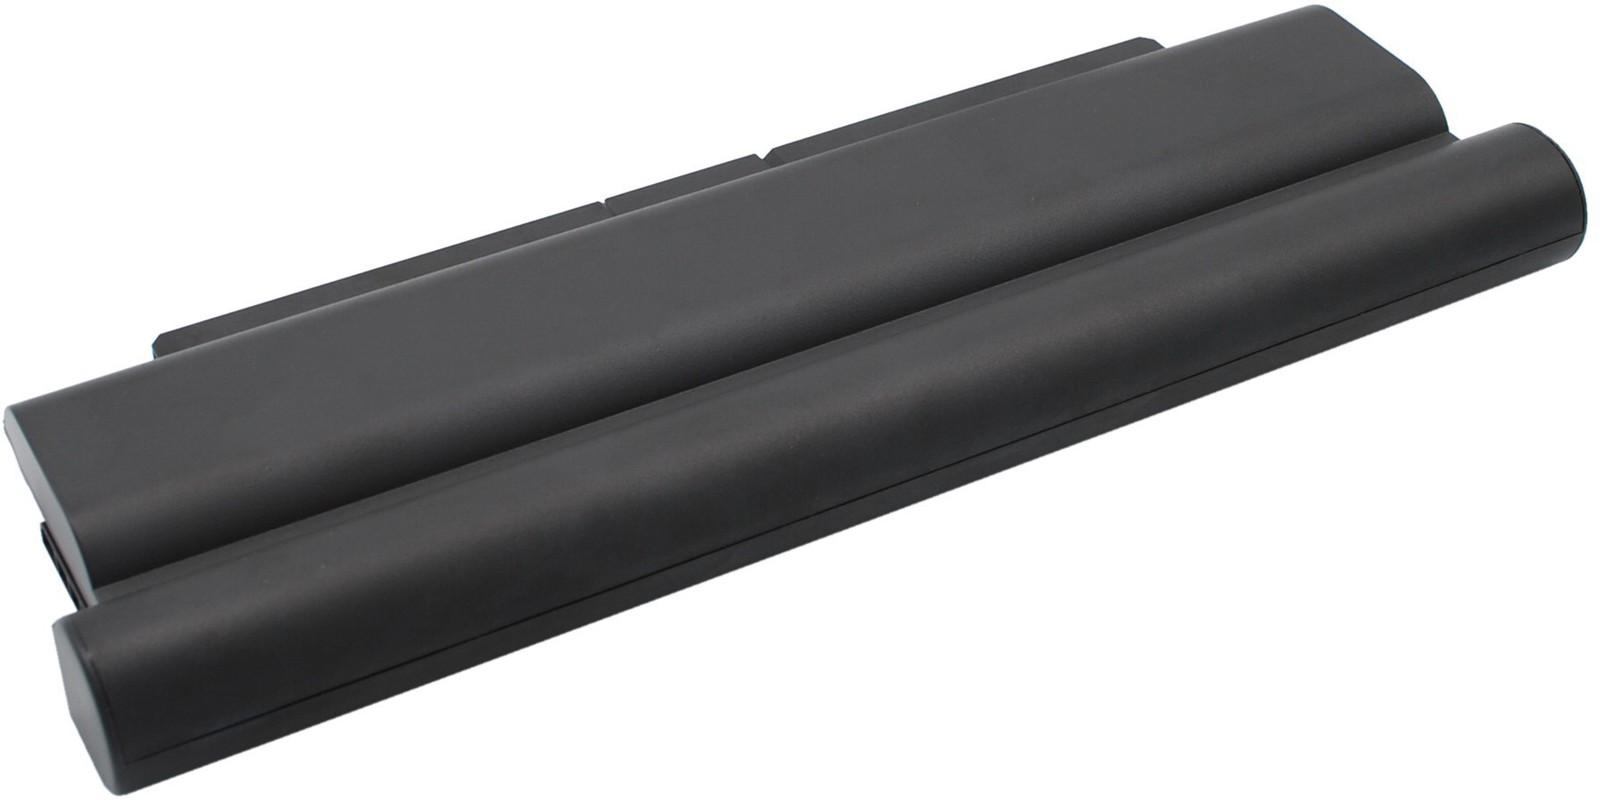 MicroBattery Laptop Battery for Lenovo 73Wh 9 Cell Li-ion 11.1V 6.6Ah MBXLE-BA0089 - eet01